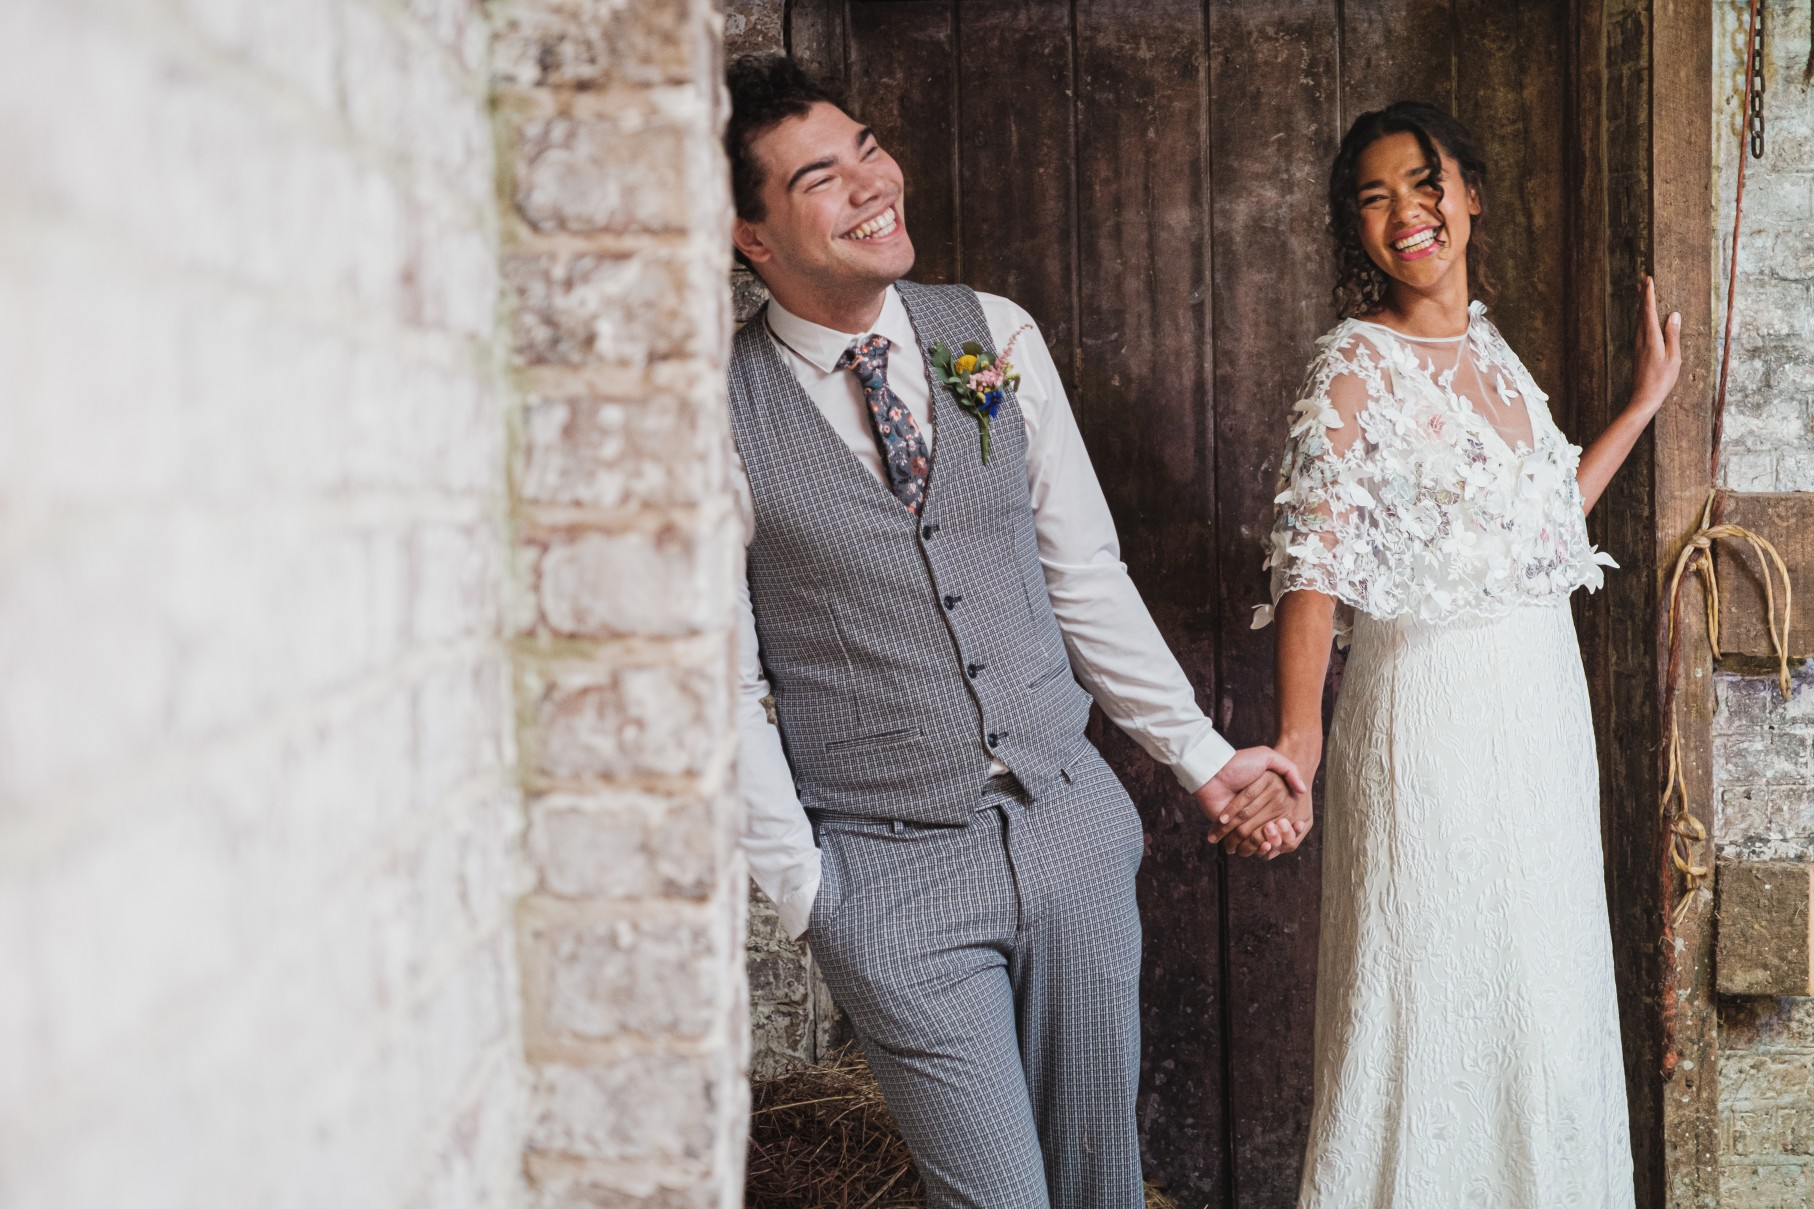 bride and groom laughing - unique bridal wear - unique grooms wear - unconventional wedding